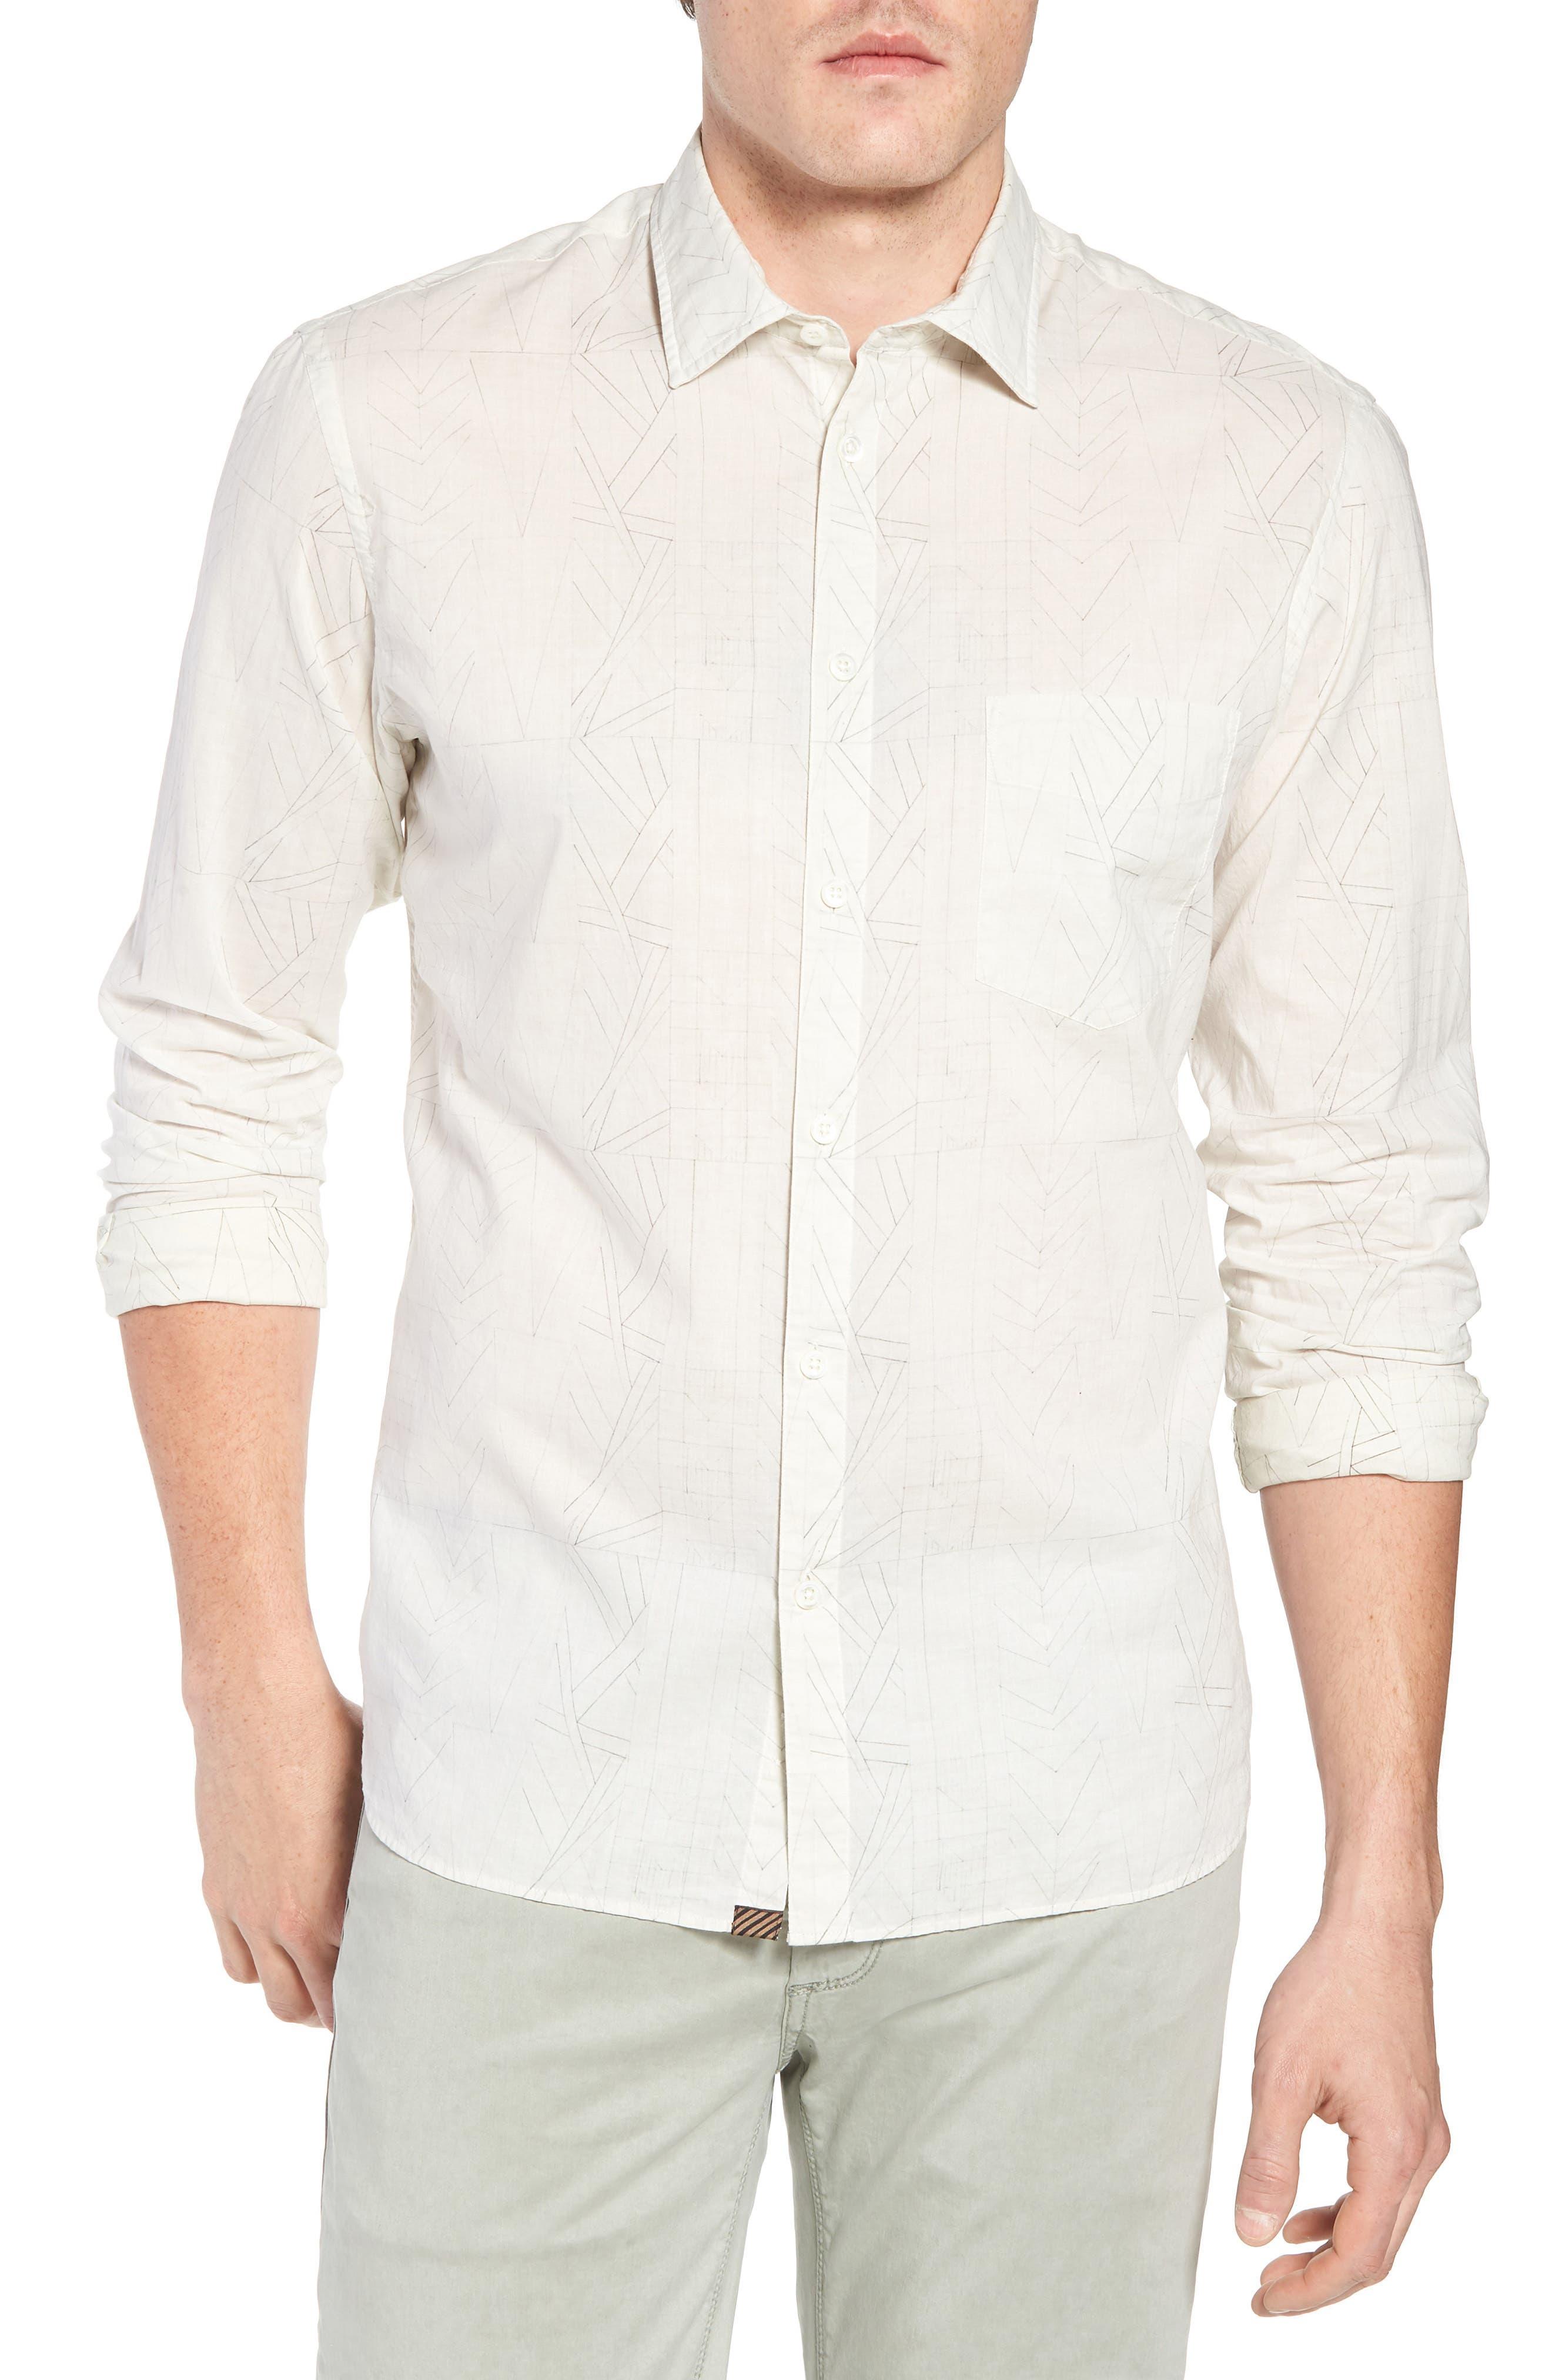 John Sport Shirt,                         Main,                         color, 108